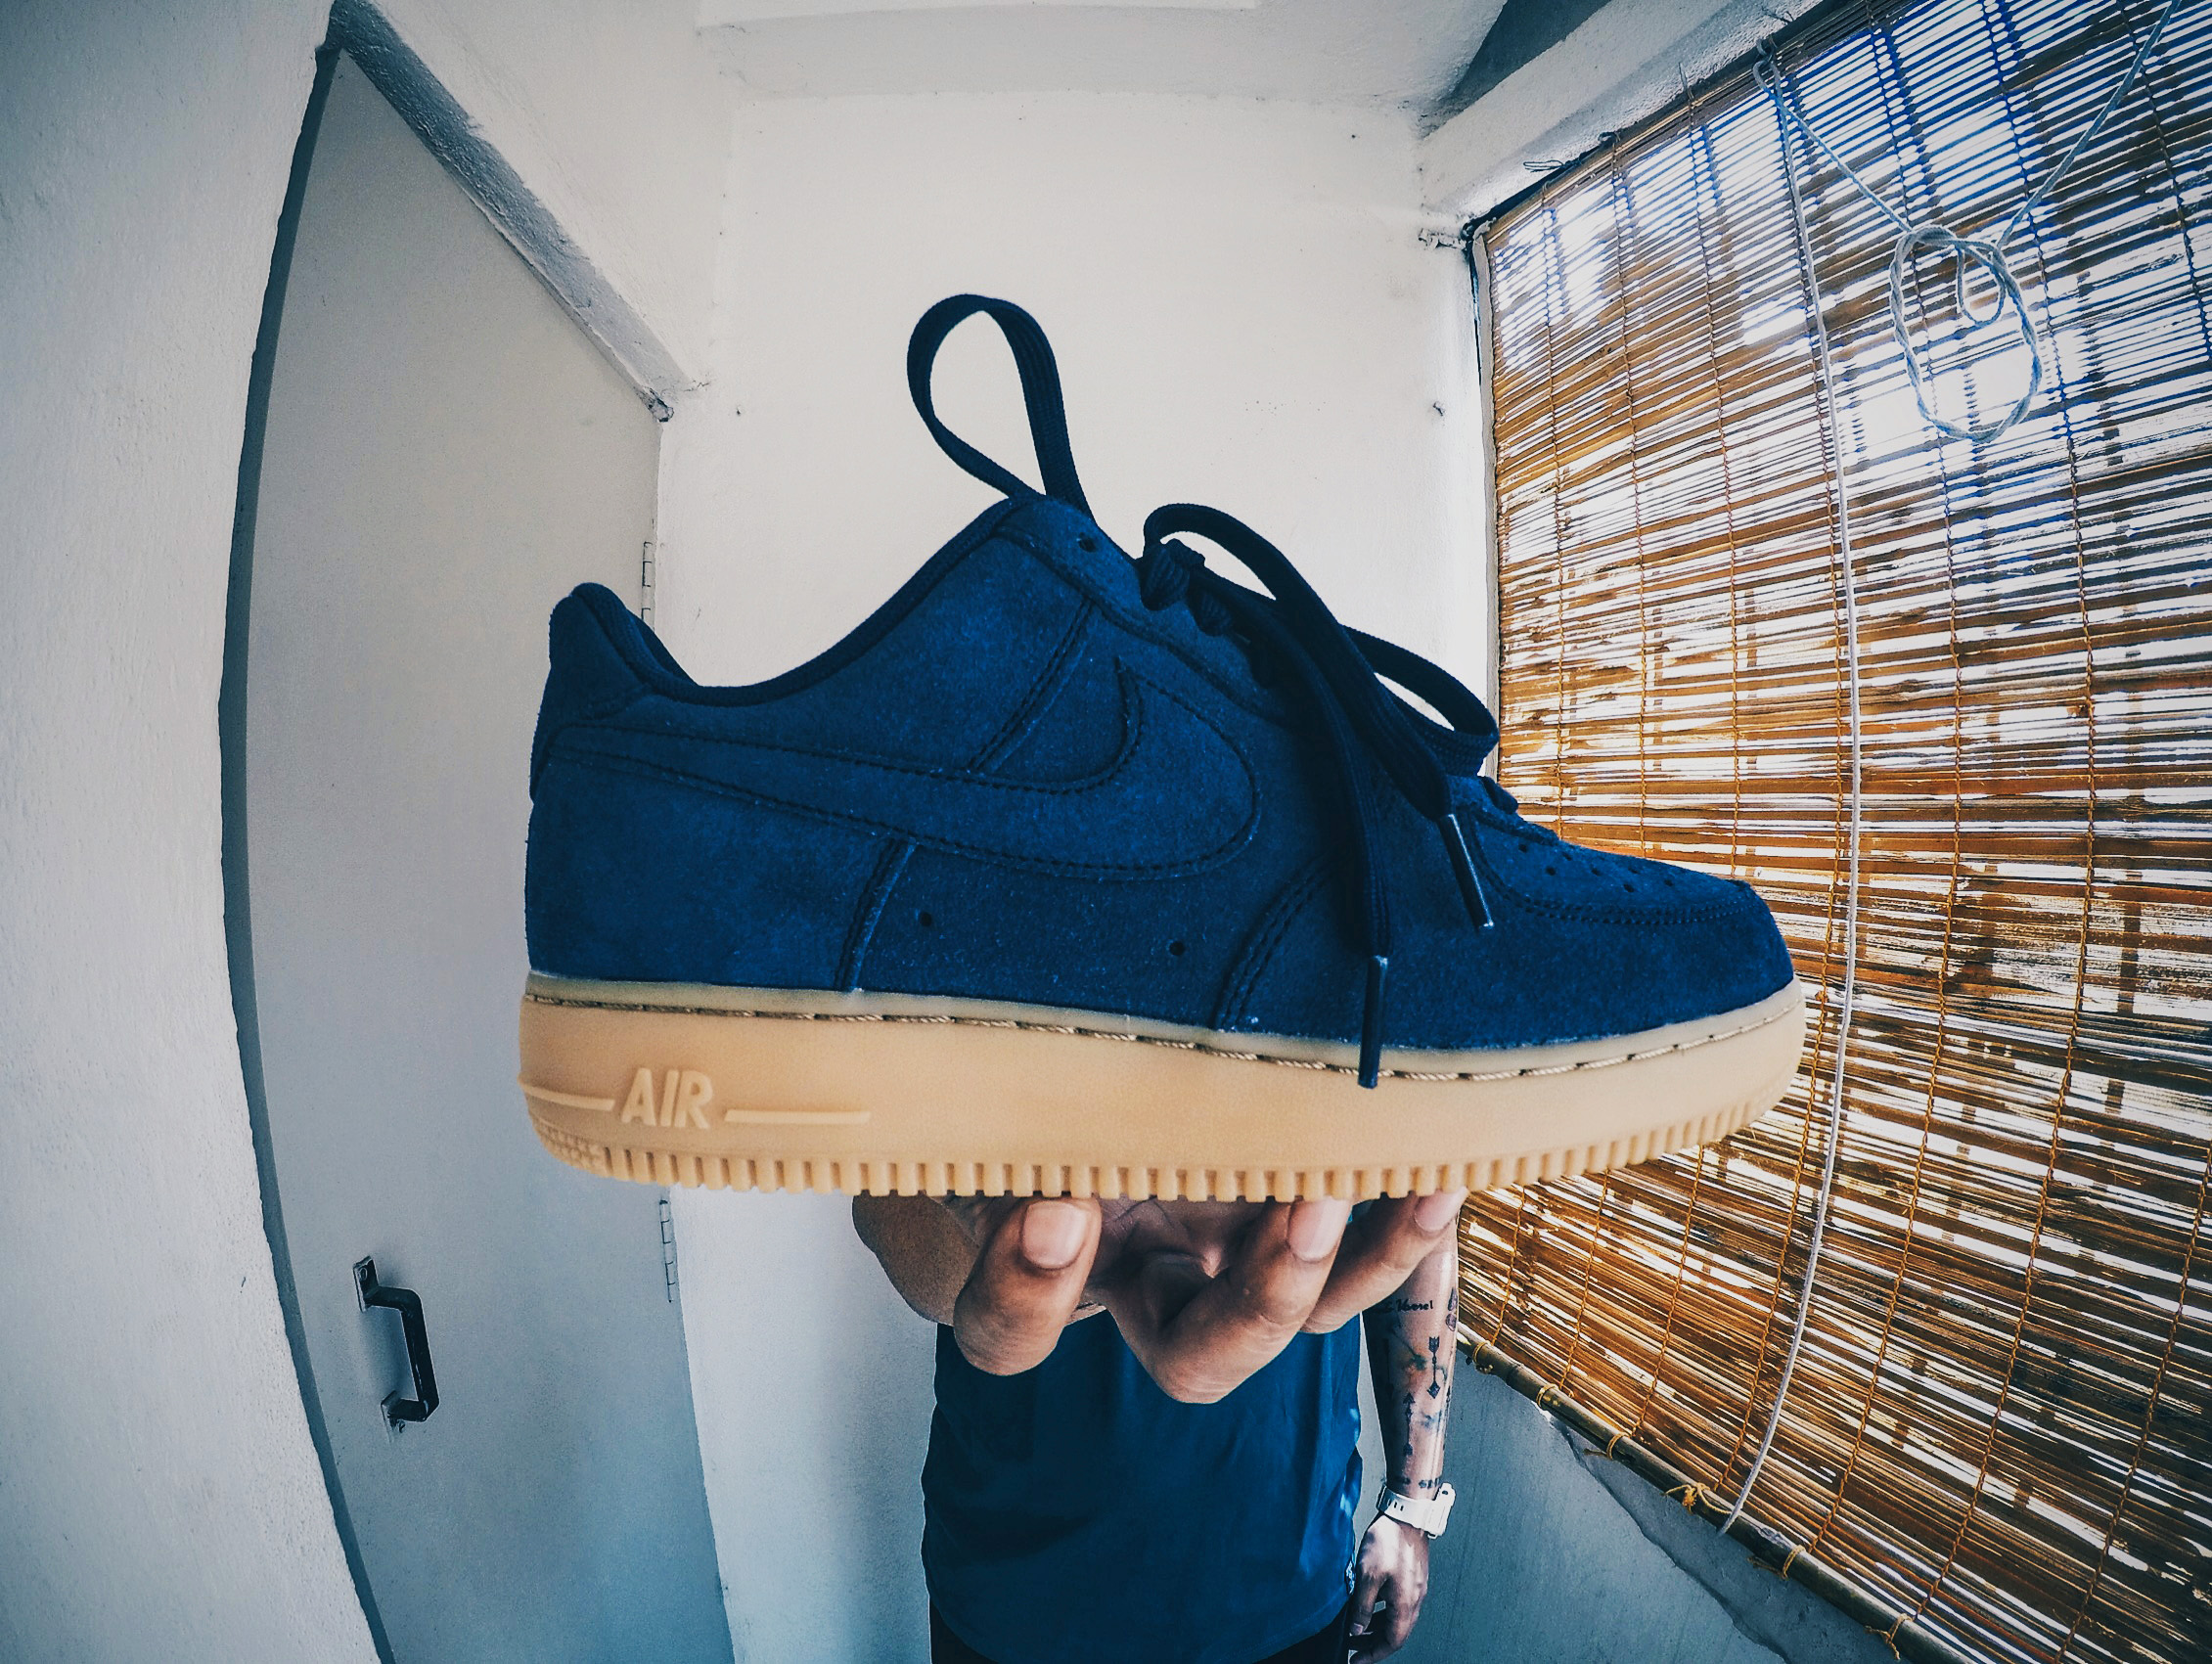 Nike Air Force 1 Suede Gum